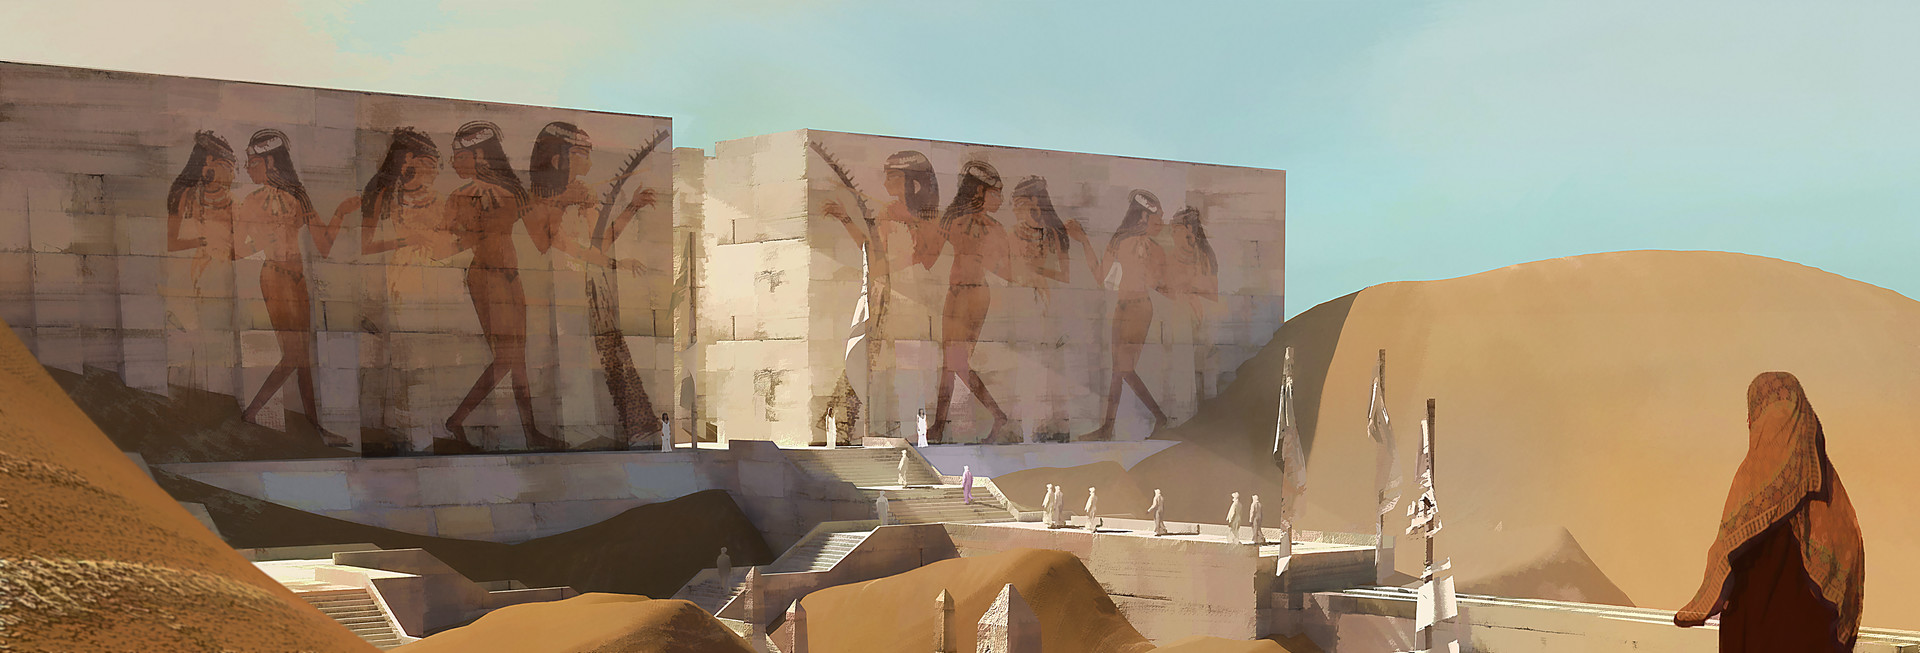 Jason cumbers sand temple final